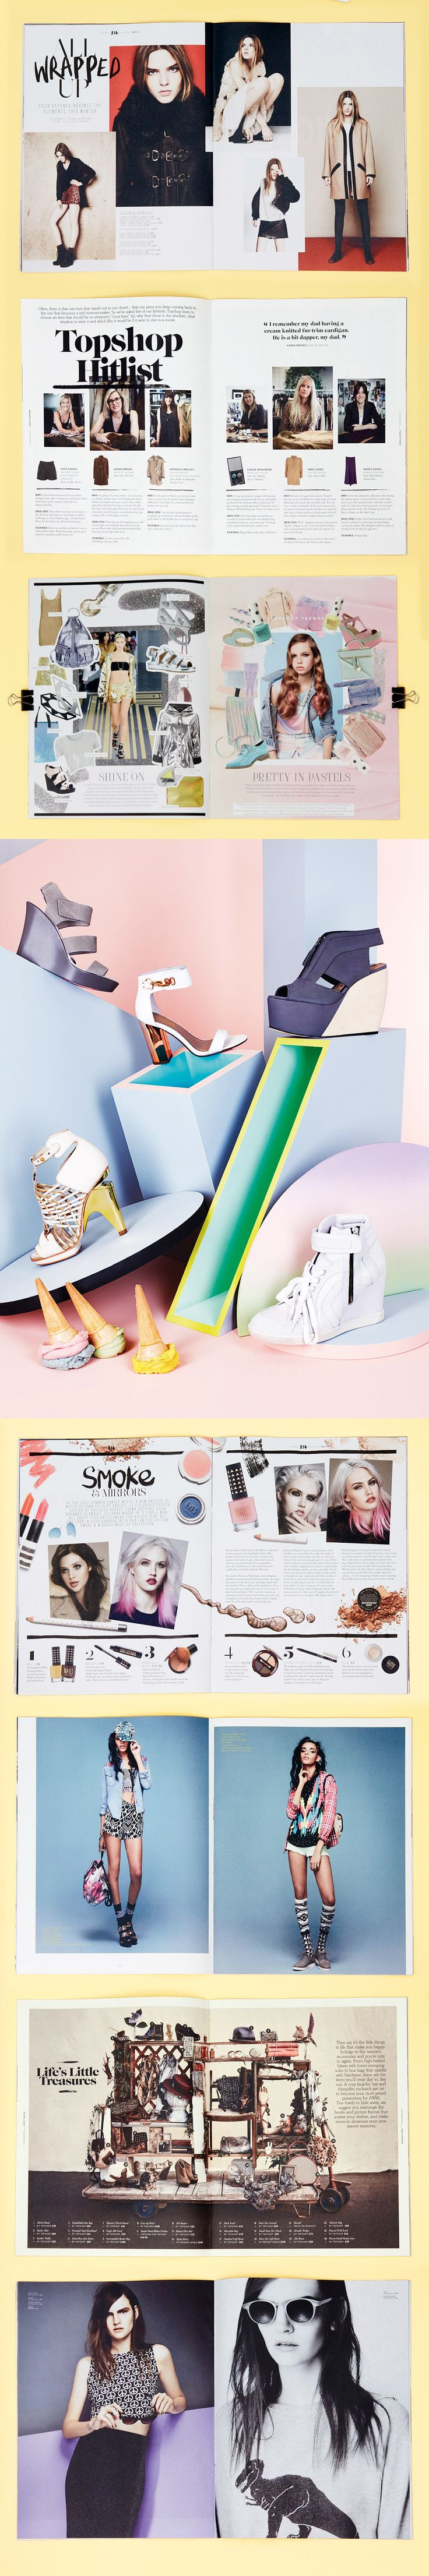 Topshop 214 magazine